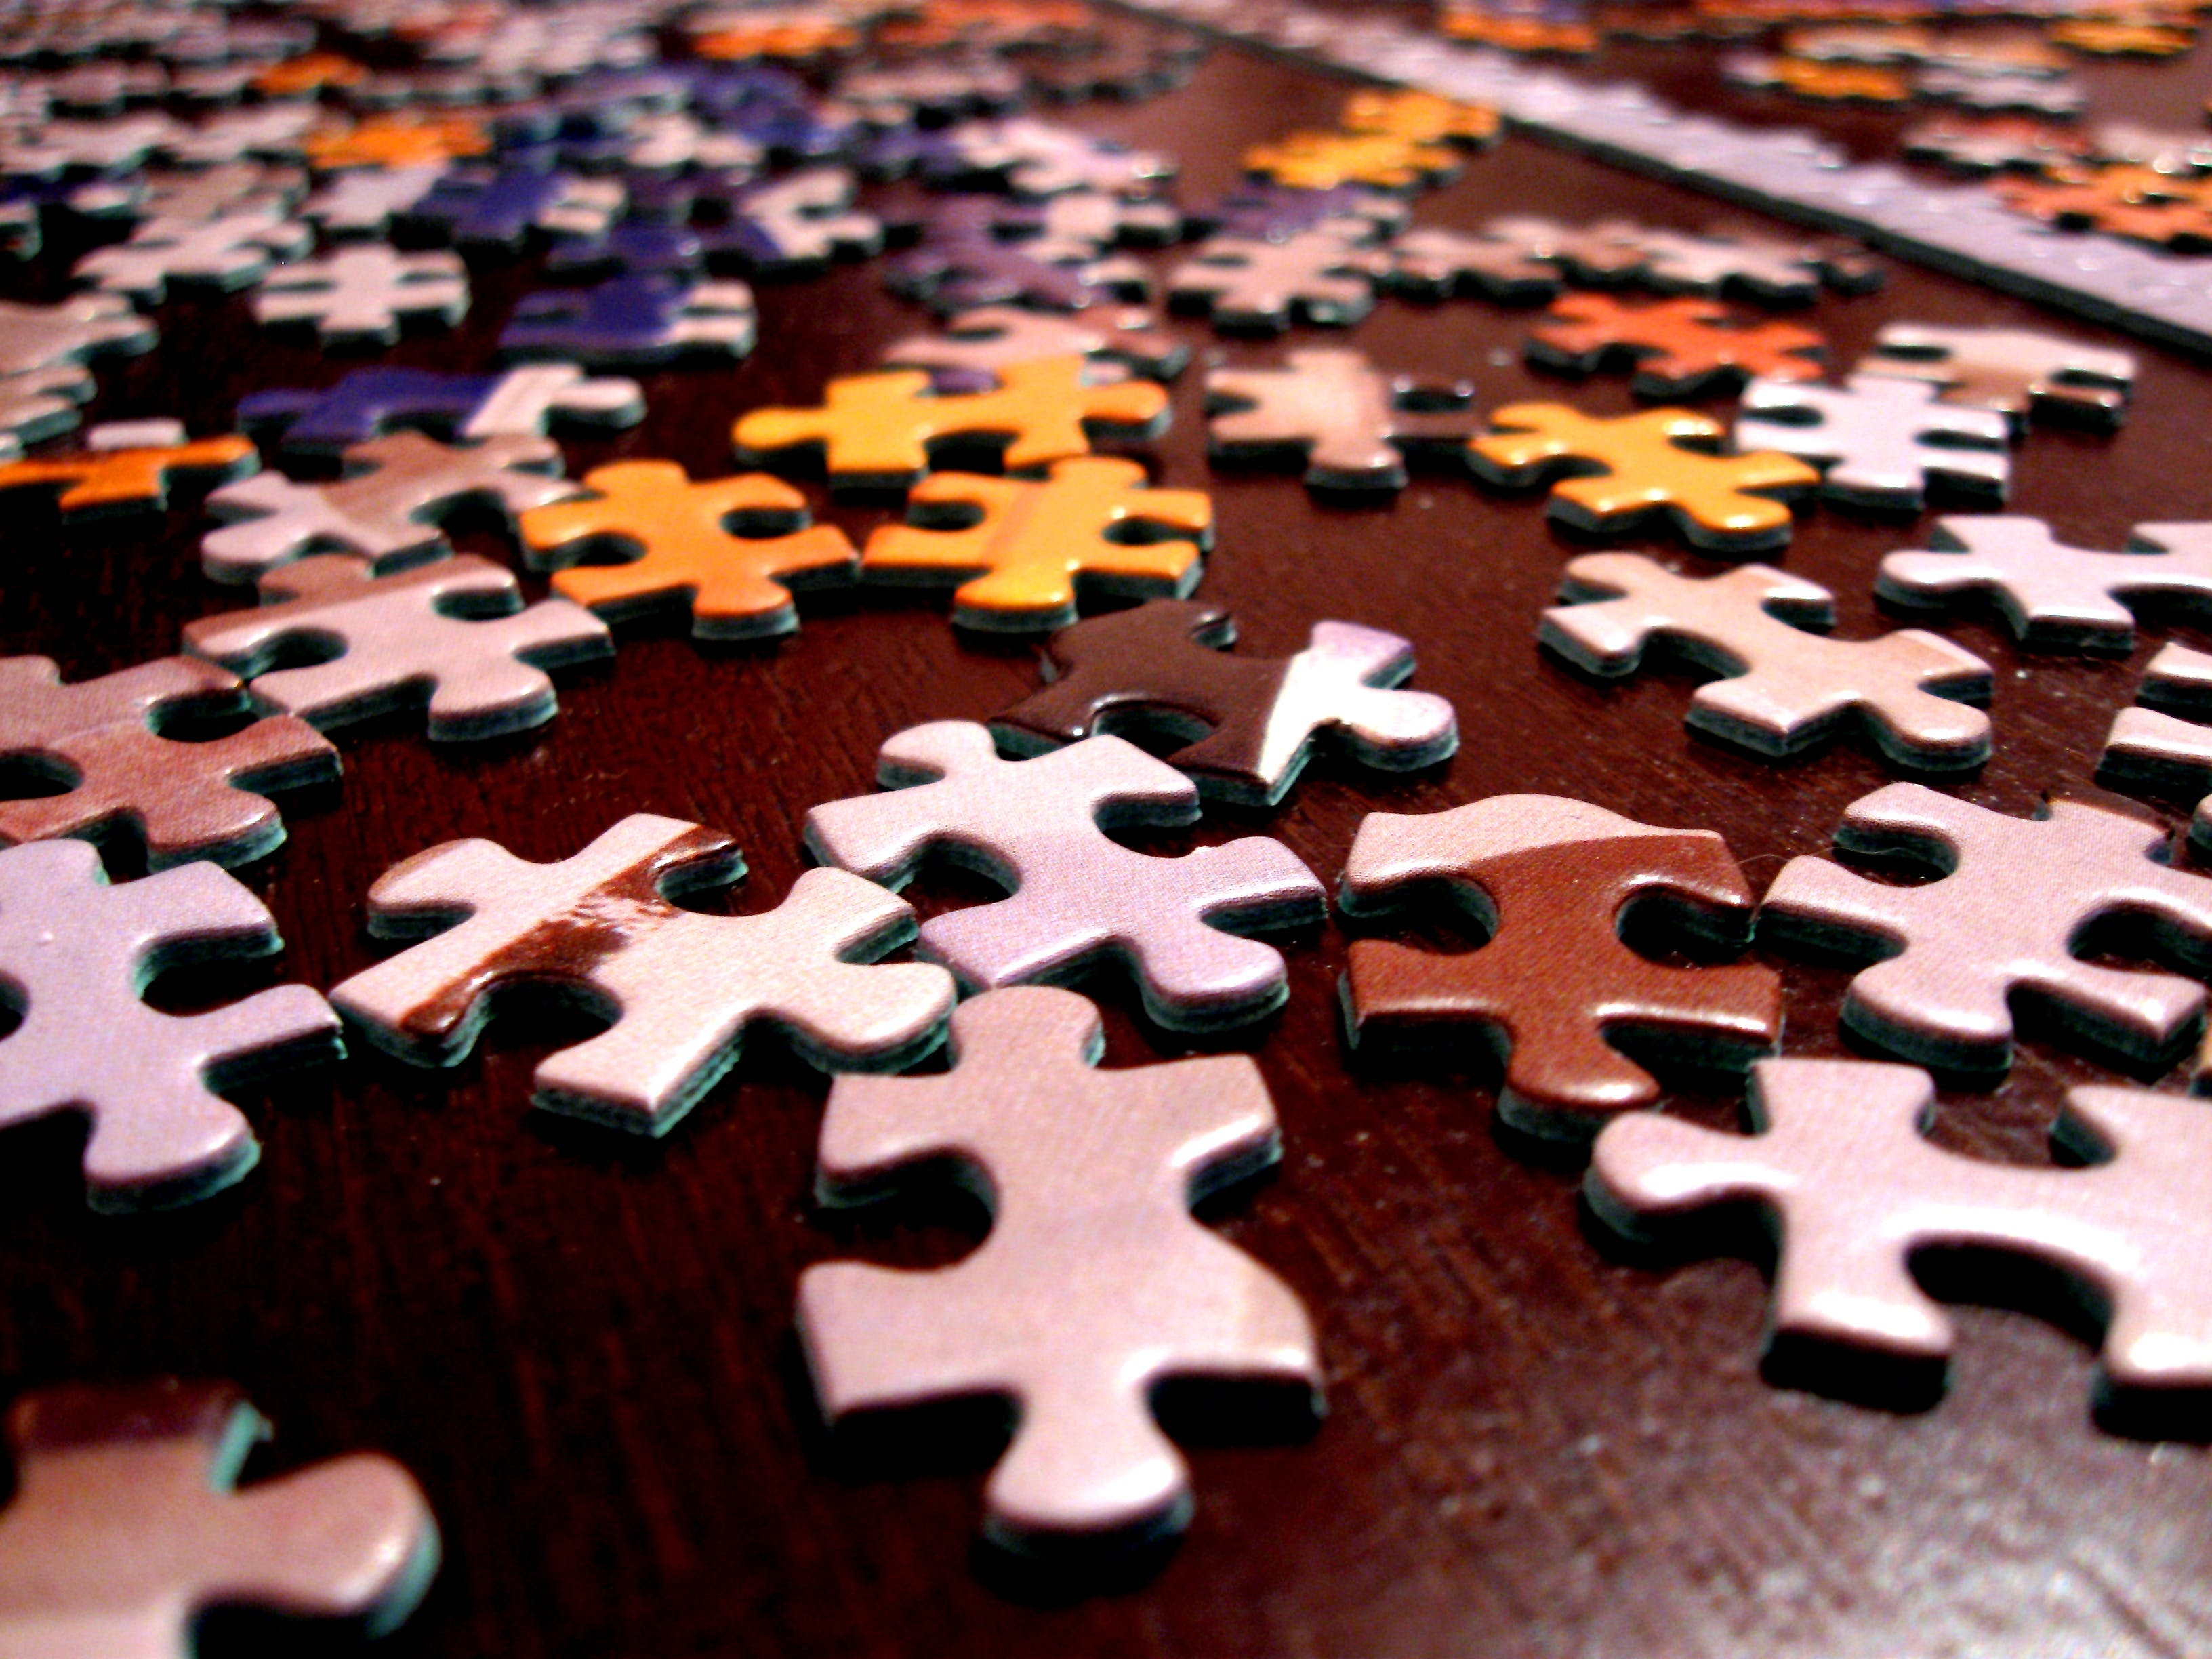 Free stock photo of creativity, game, challenge, puzzle